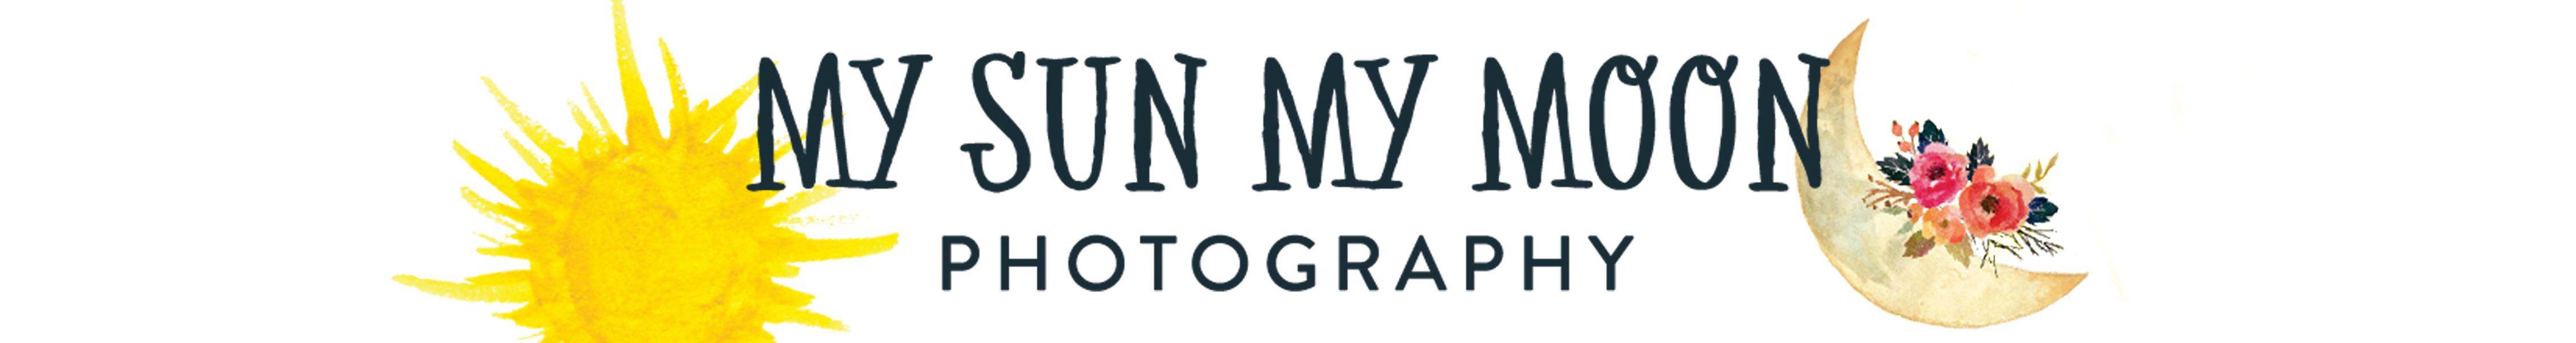 My Sun My Moon Photography